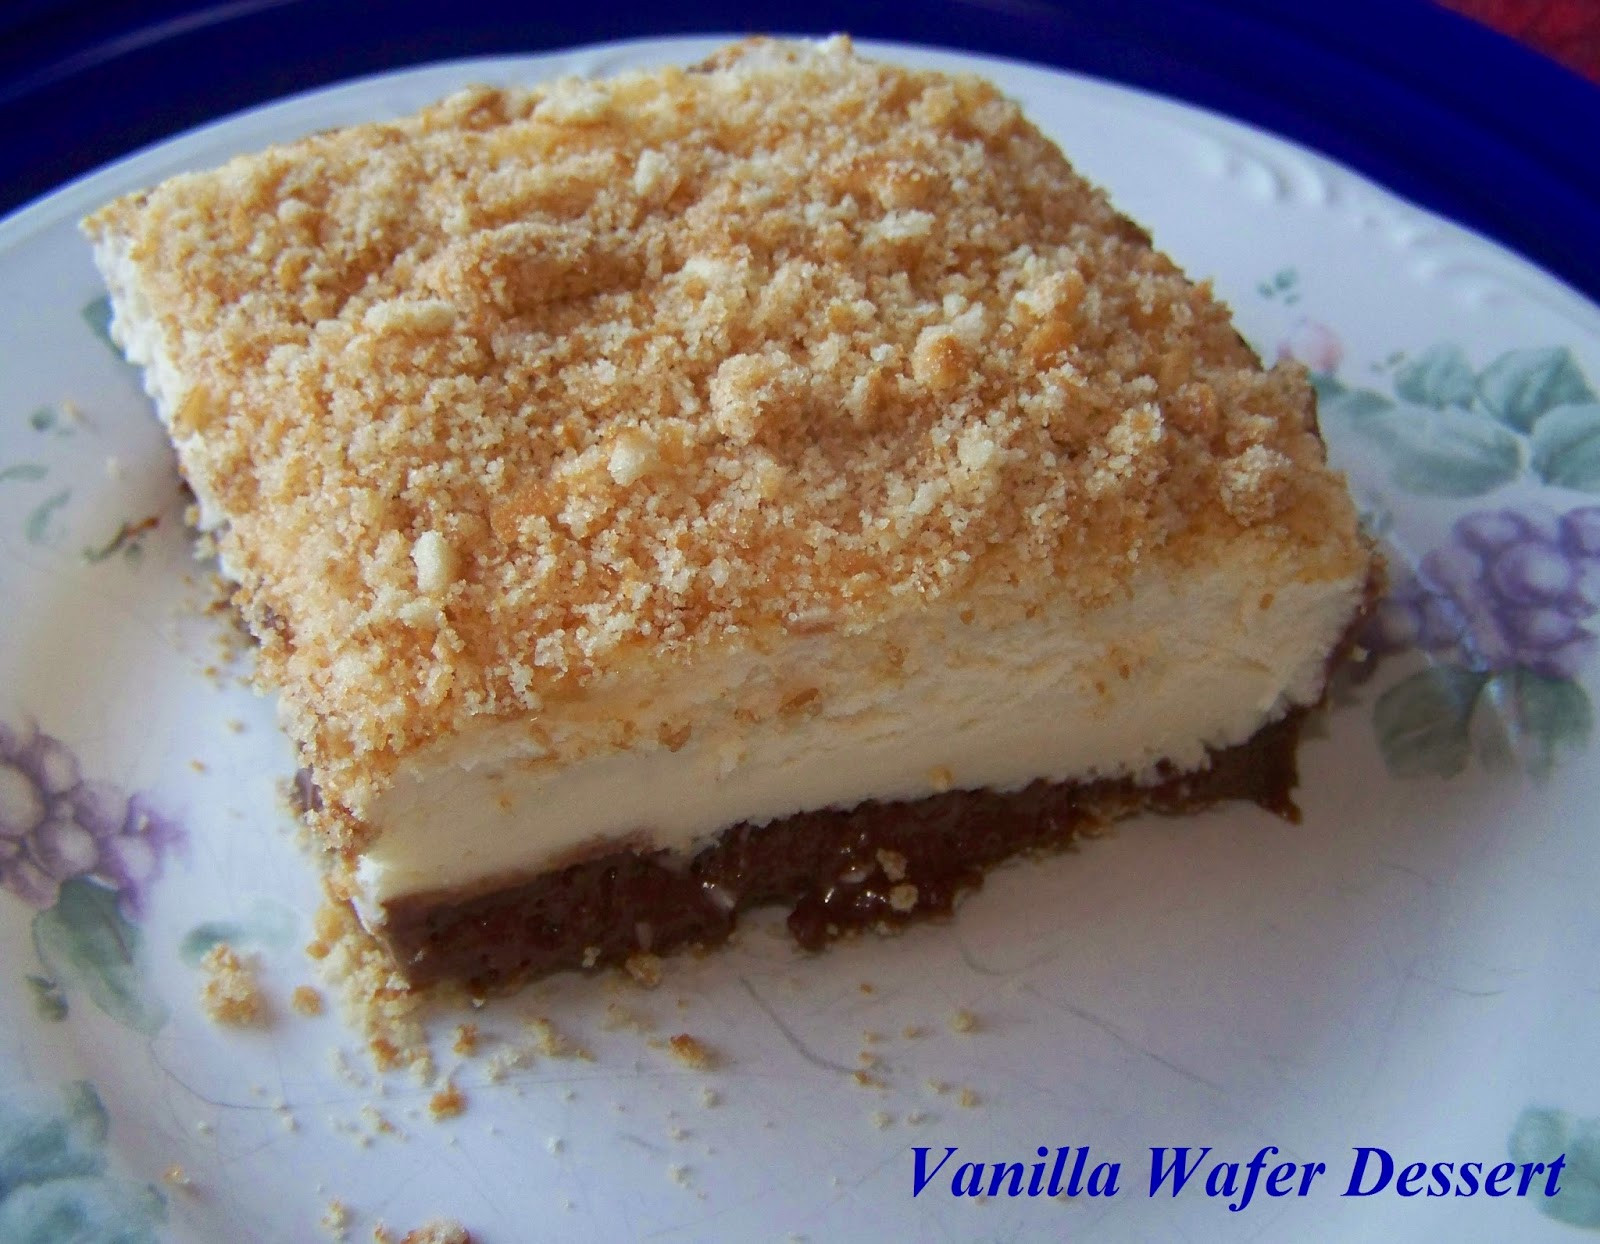 Vanilla Wafer Dessert  2 Kids and Tired Cooks February 2015